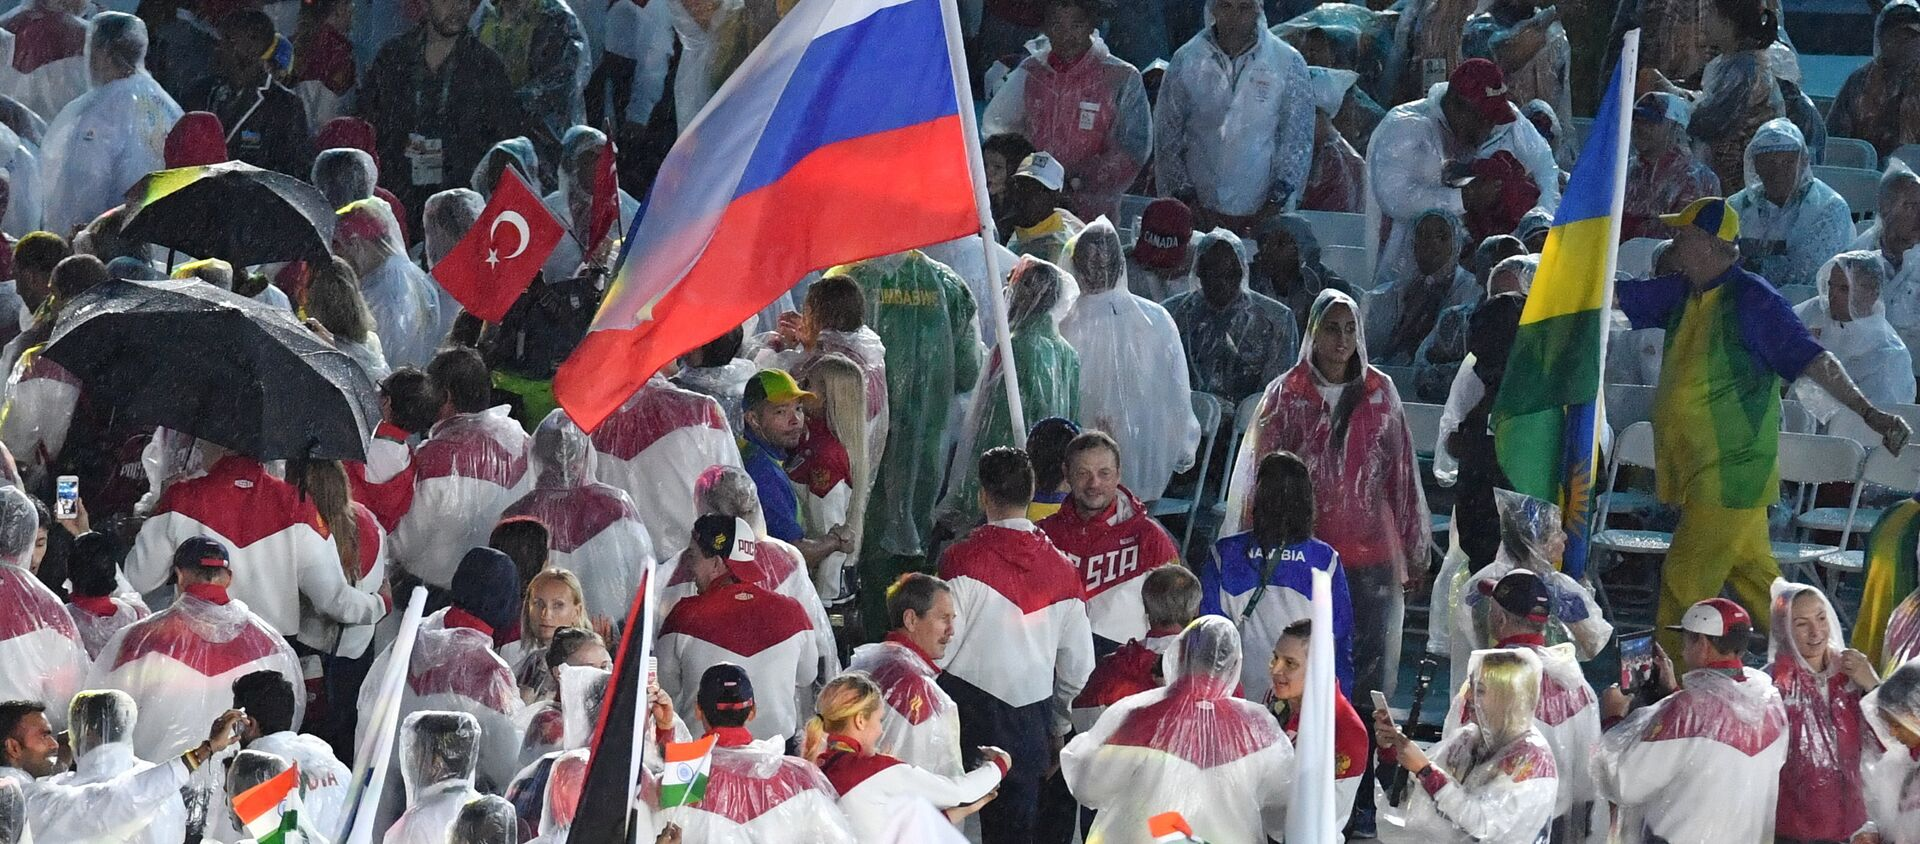 Церемония закрытия XXXI летних Олимпийских игр в Рио-де-Жанейро - Sputnik Узбекистан, 1920, 28.11.2017